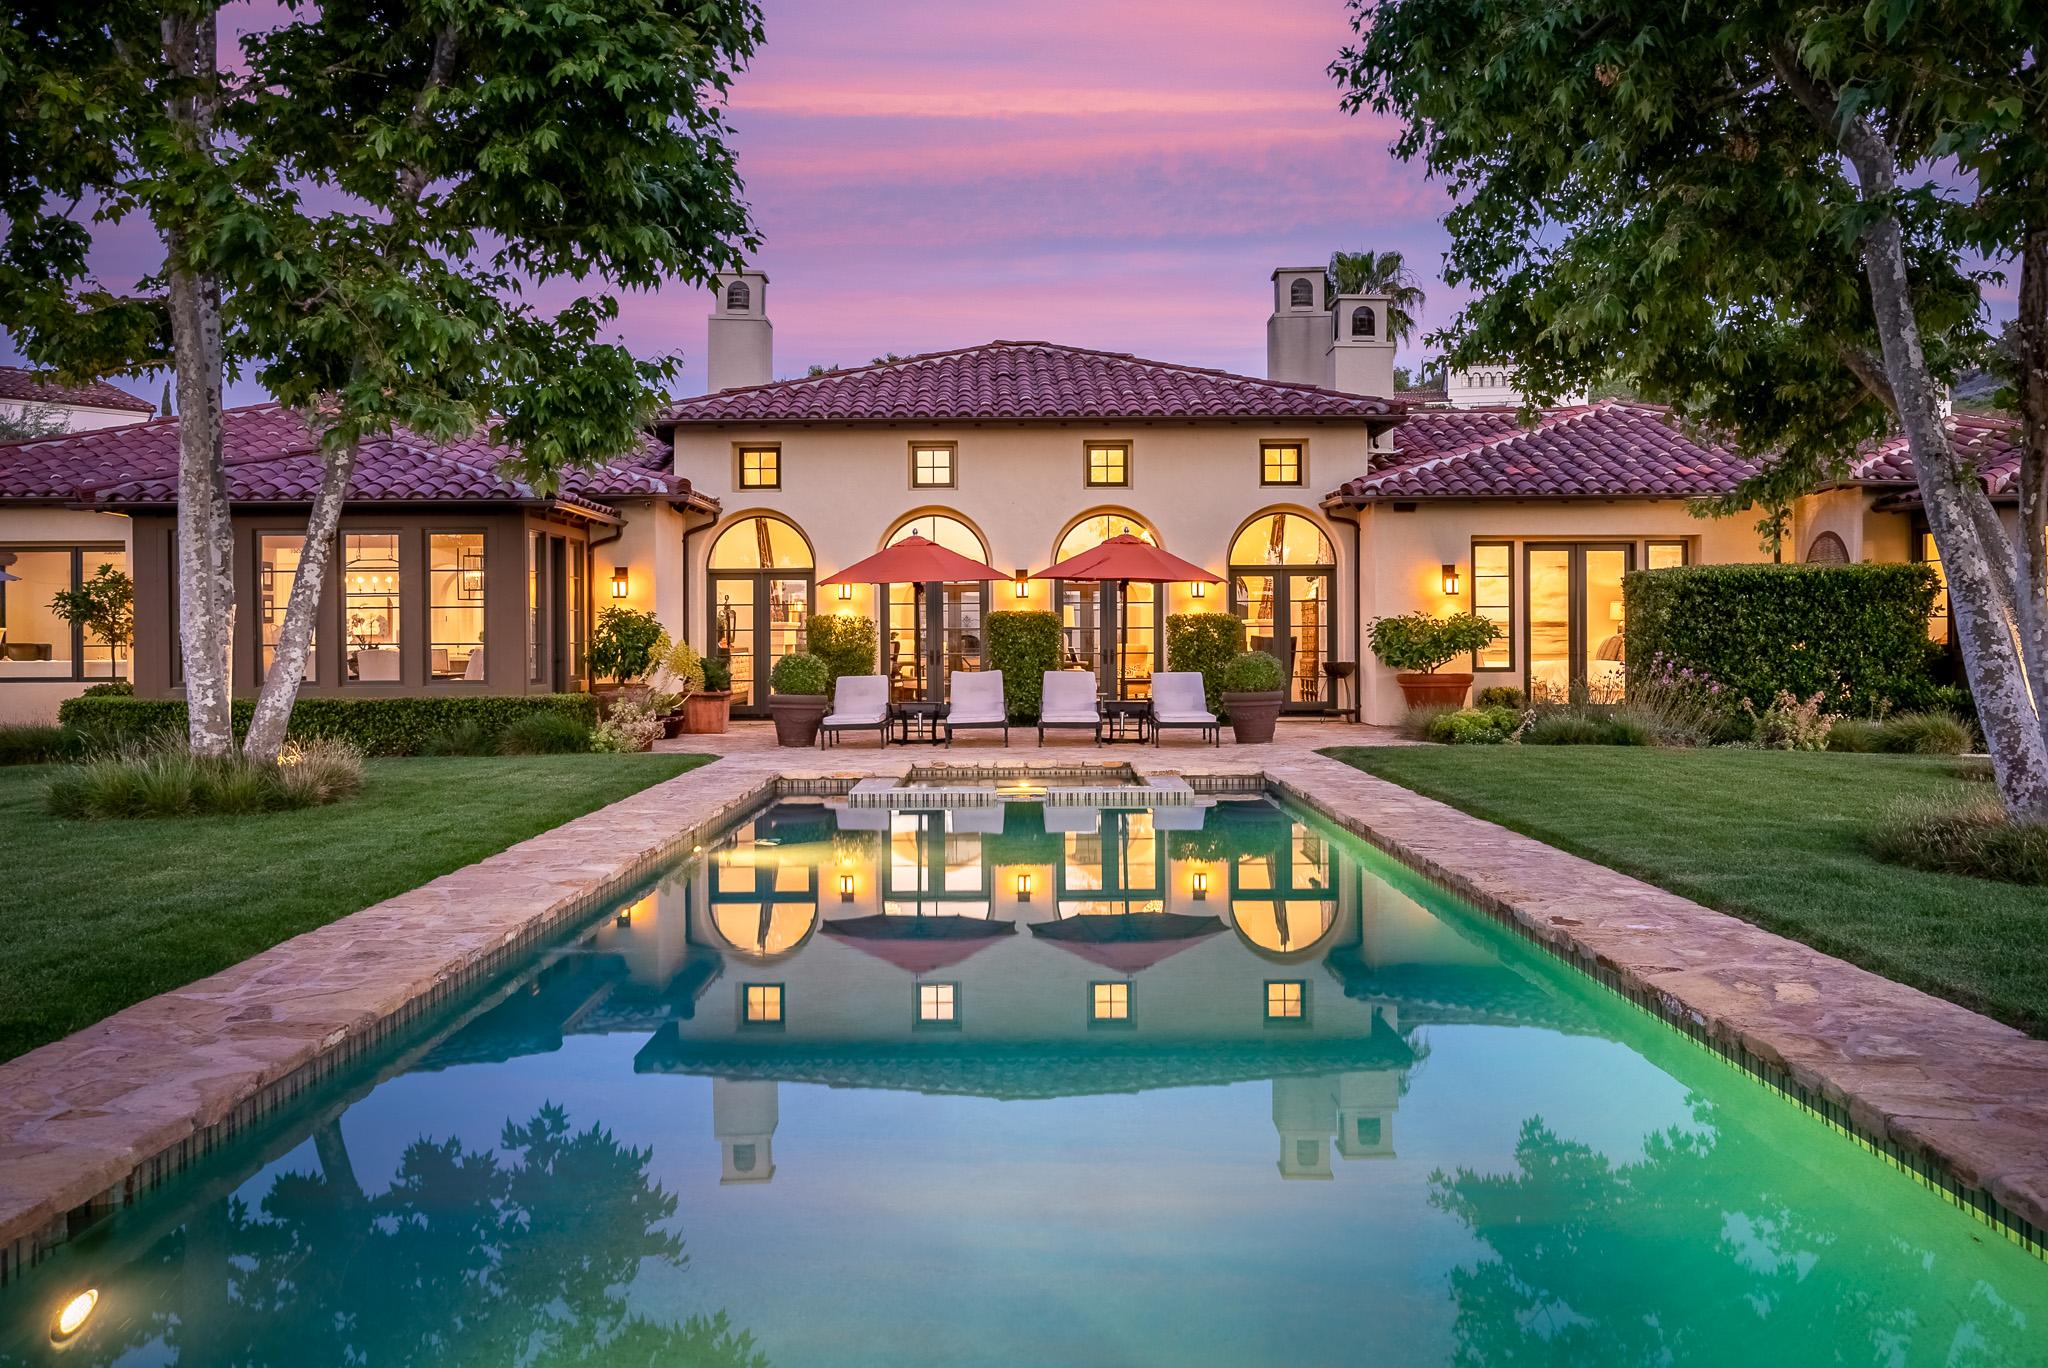 Sold 2021 Laura Represented Seller -  San Diego, CA 92127